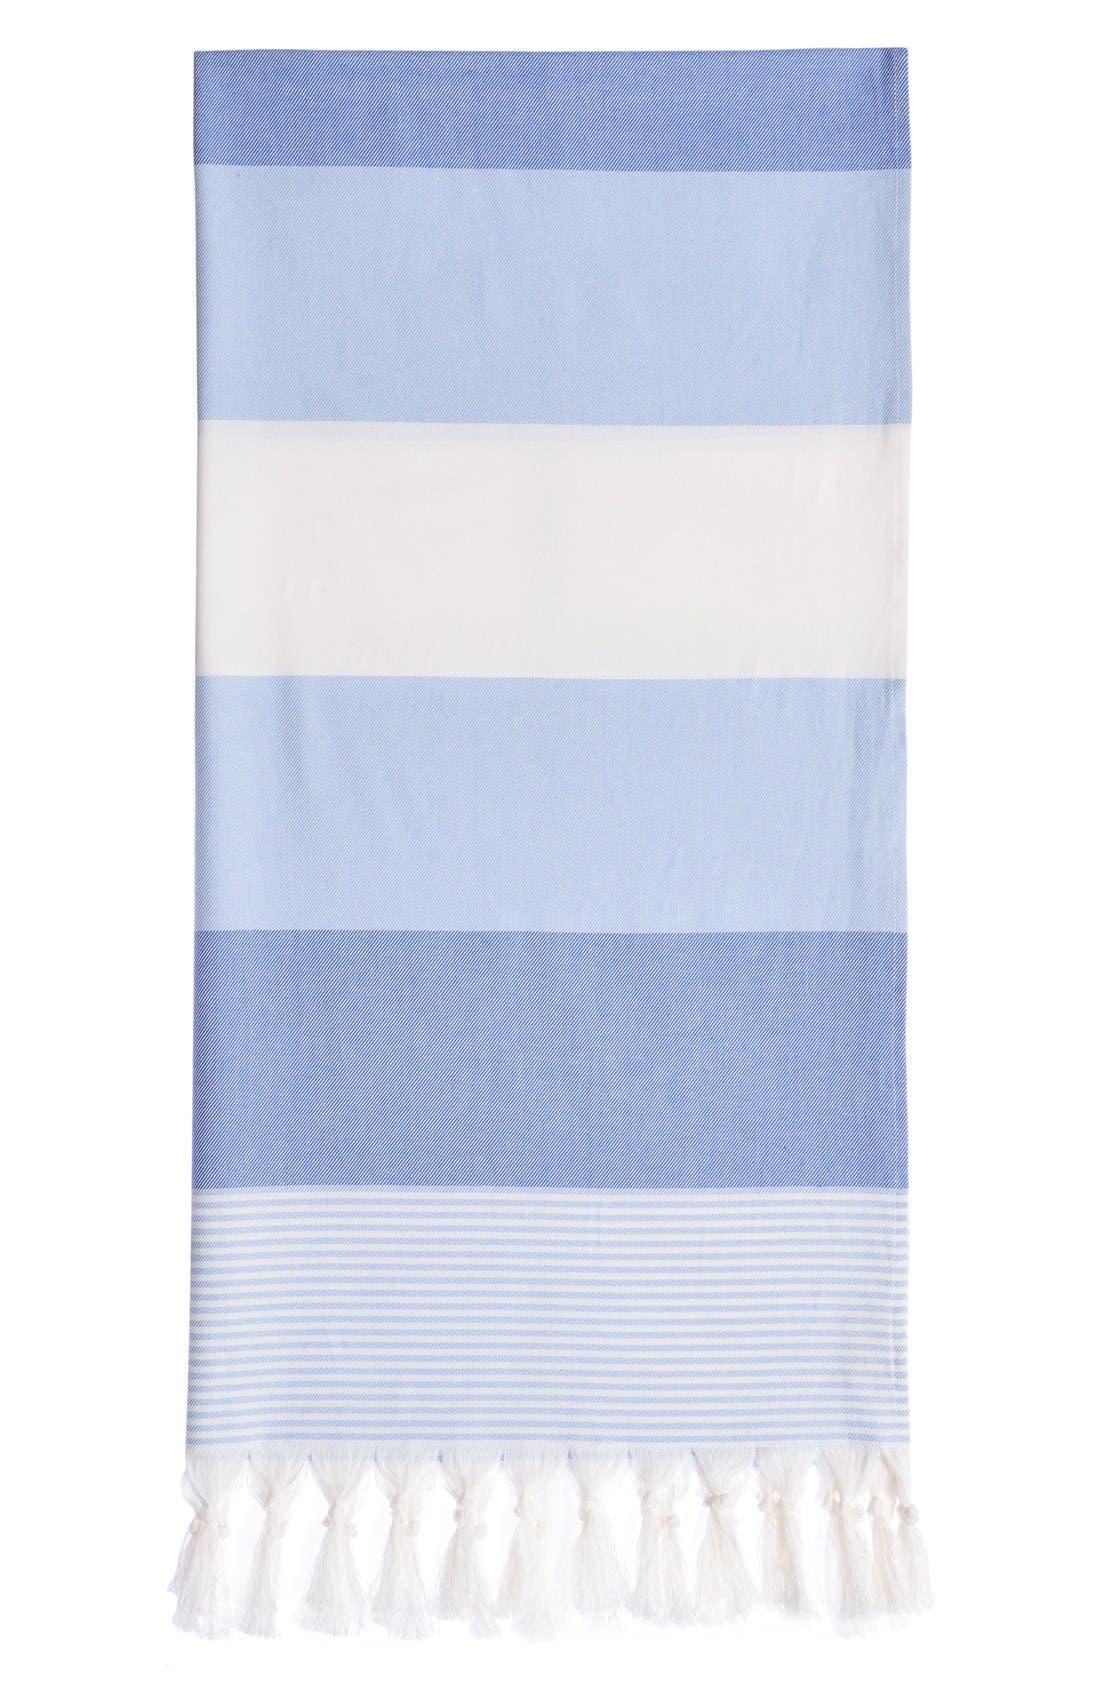 'Sea Waves' Turkish Pestemal Towel,                             Main thumbnail 1, color,                             Ocean Blue